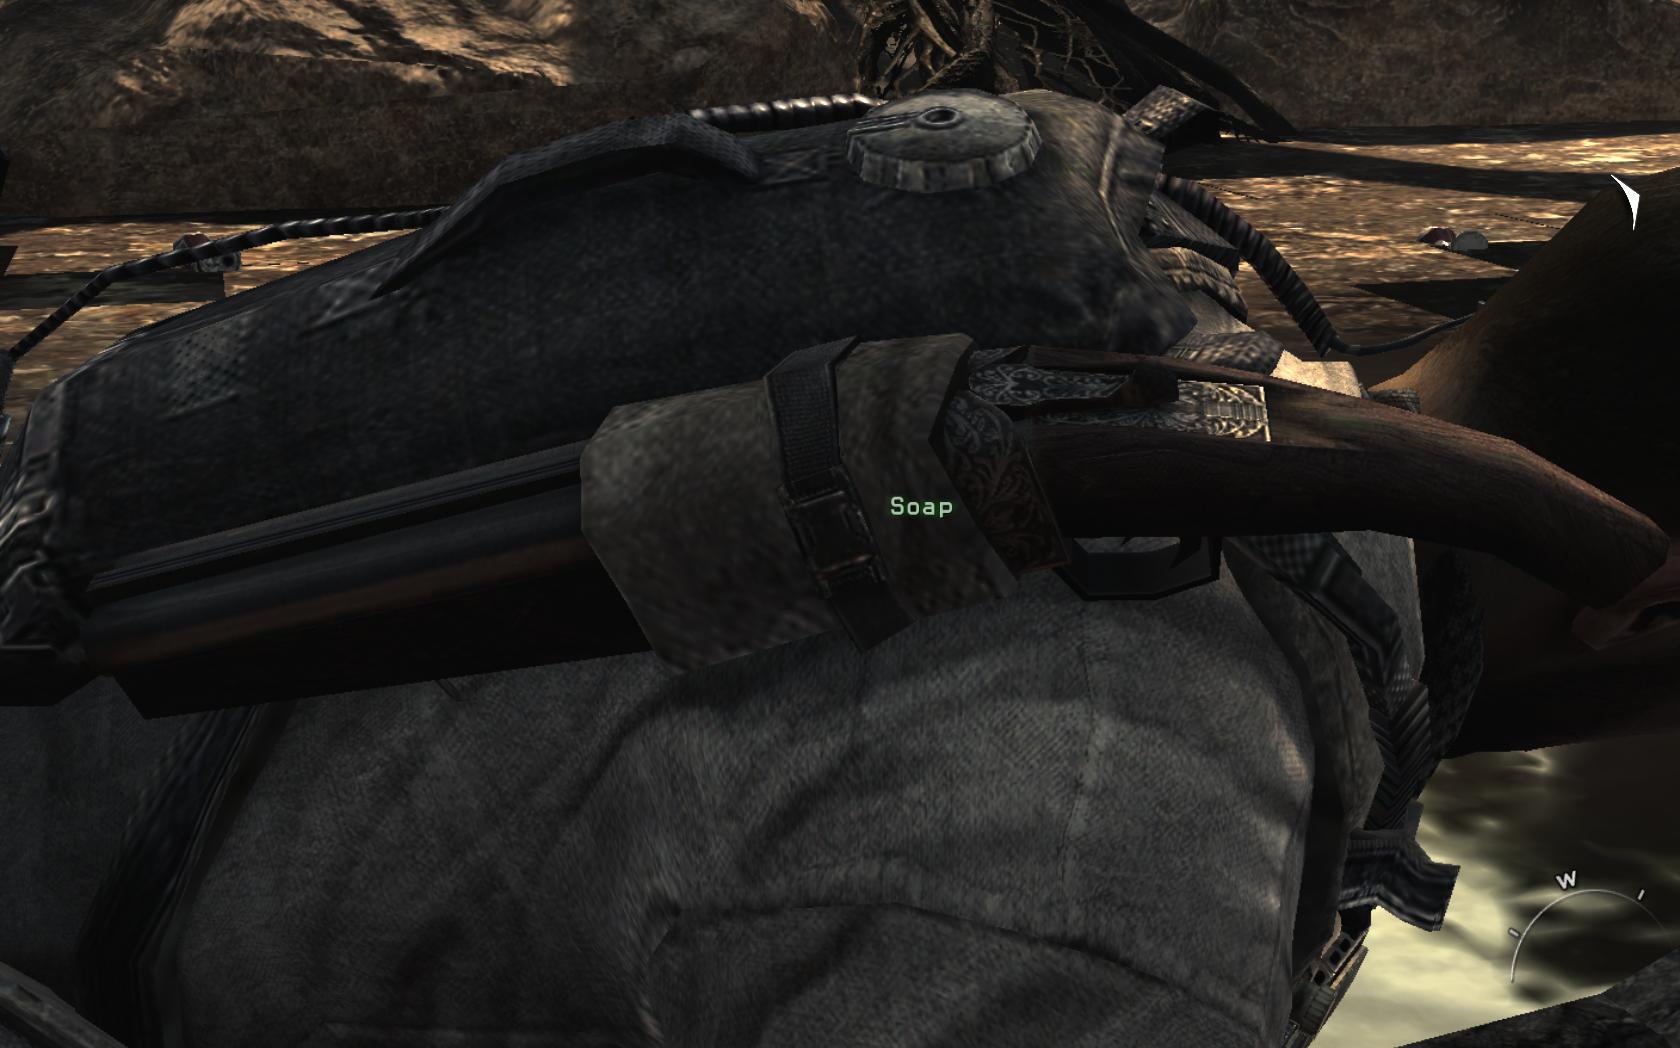 Ranger (weapon) | Call of Duty Wiki | FANDOM powered by Wikia